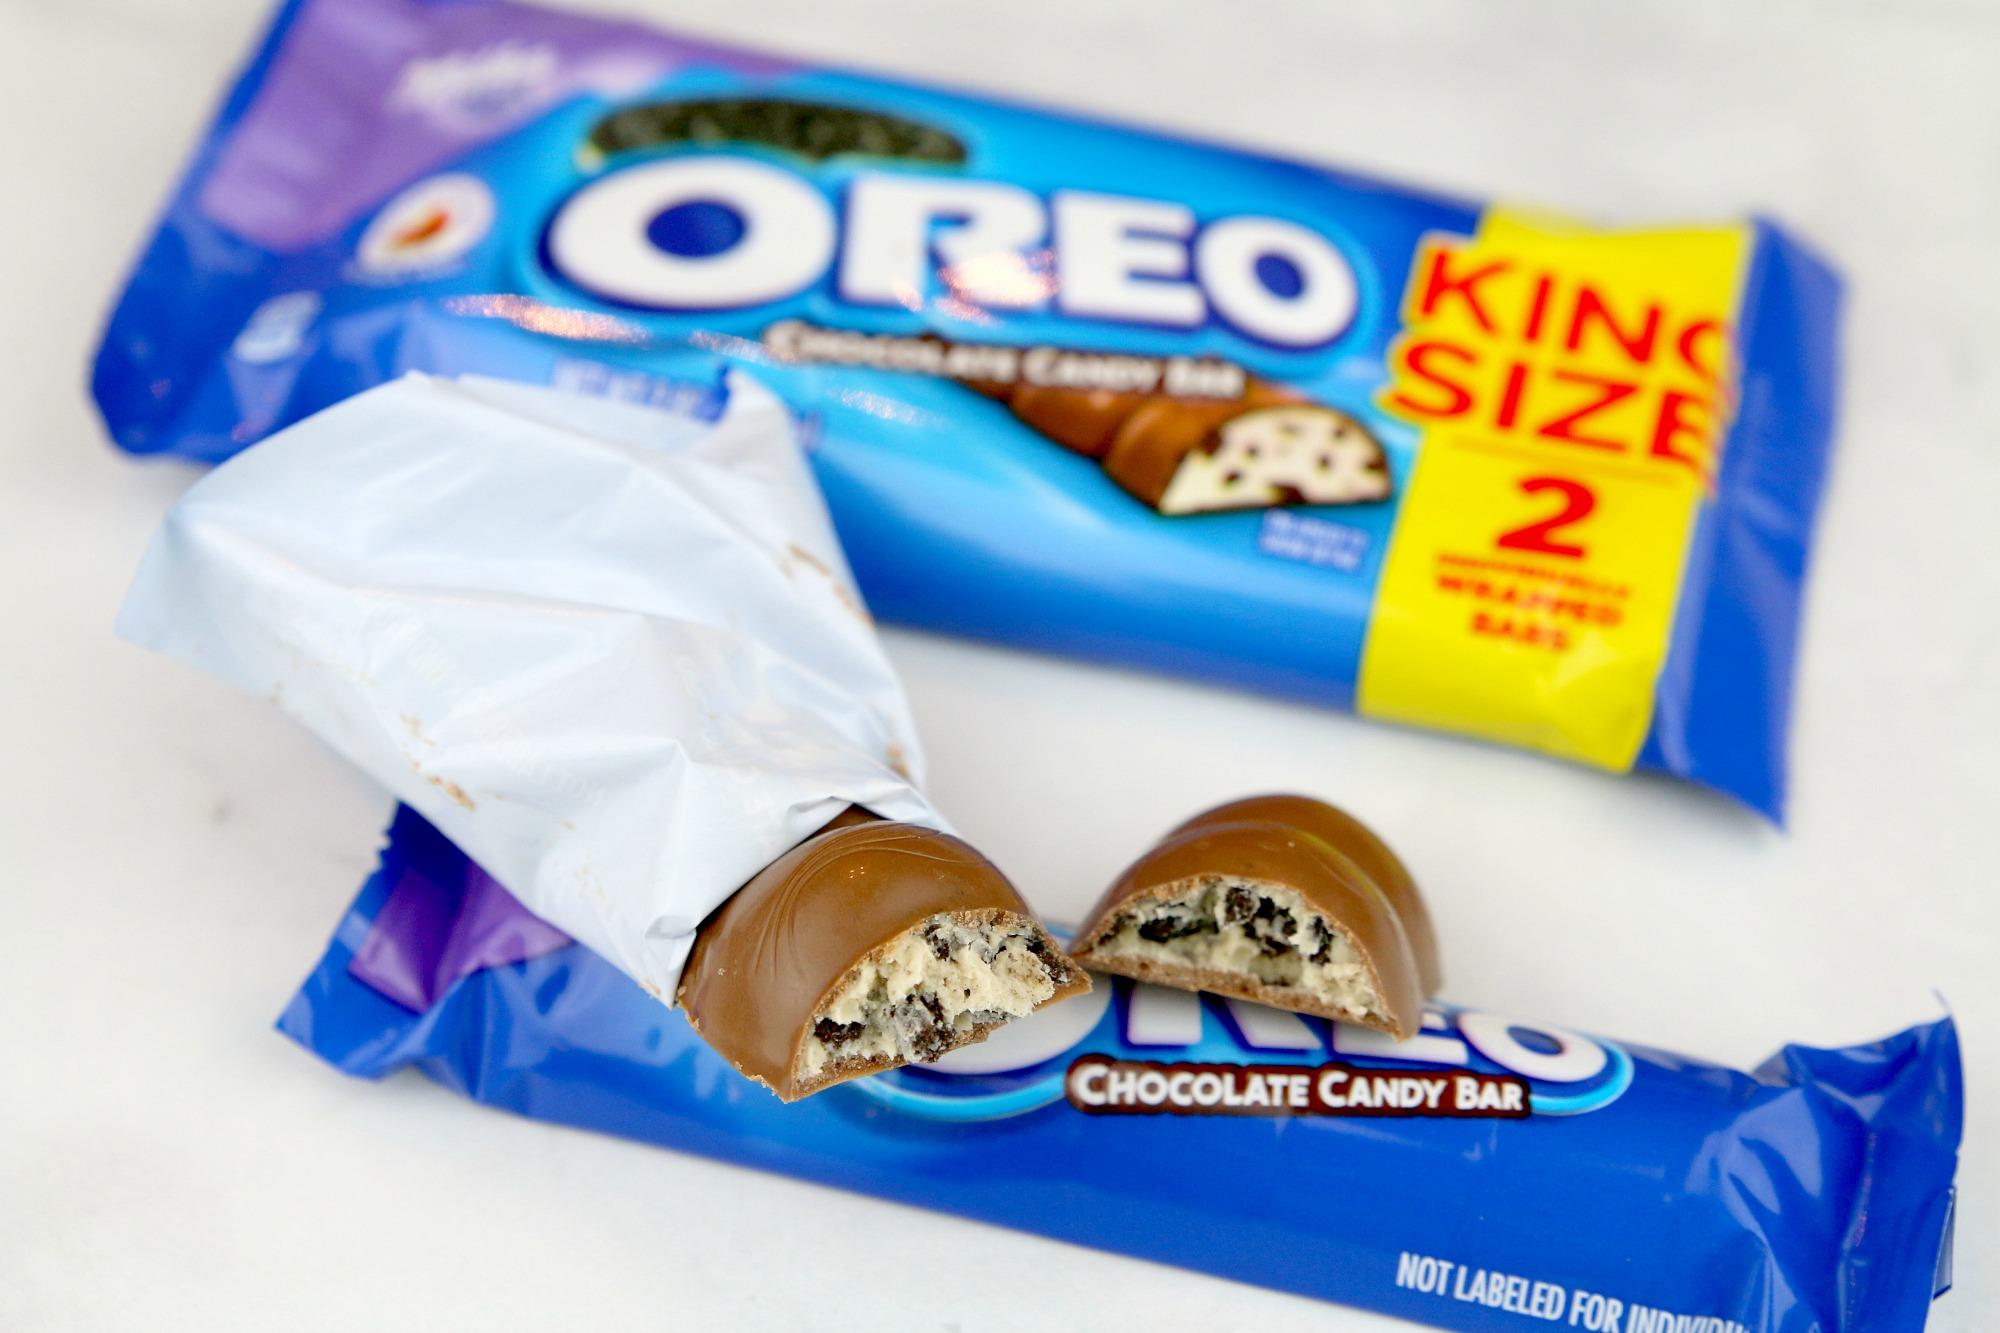 Inside an Oreo Chocolate Candy Bar